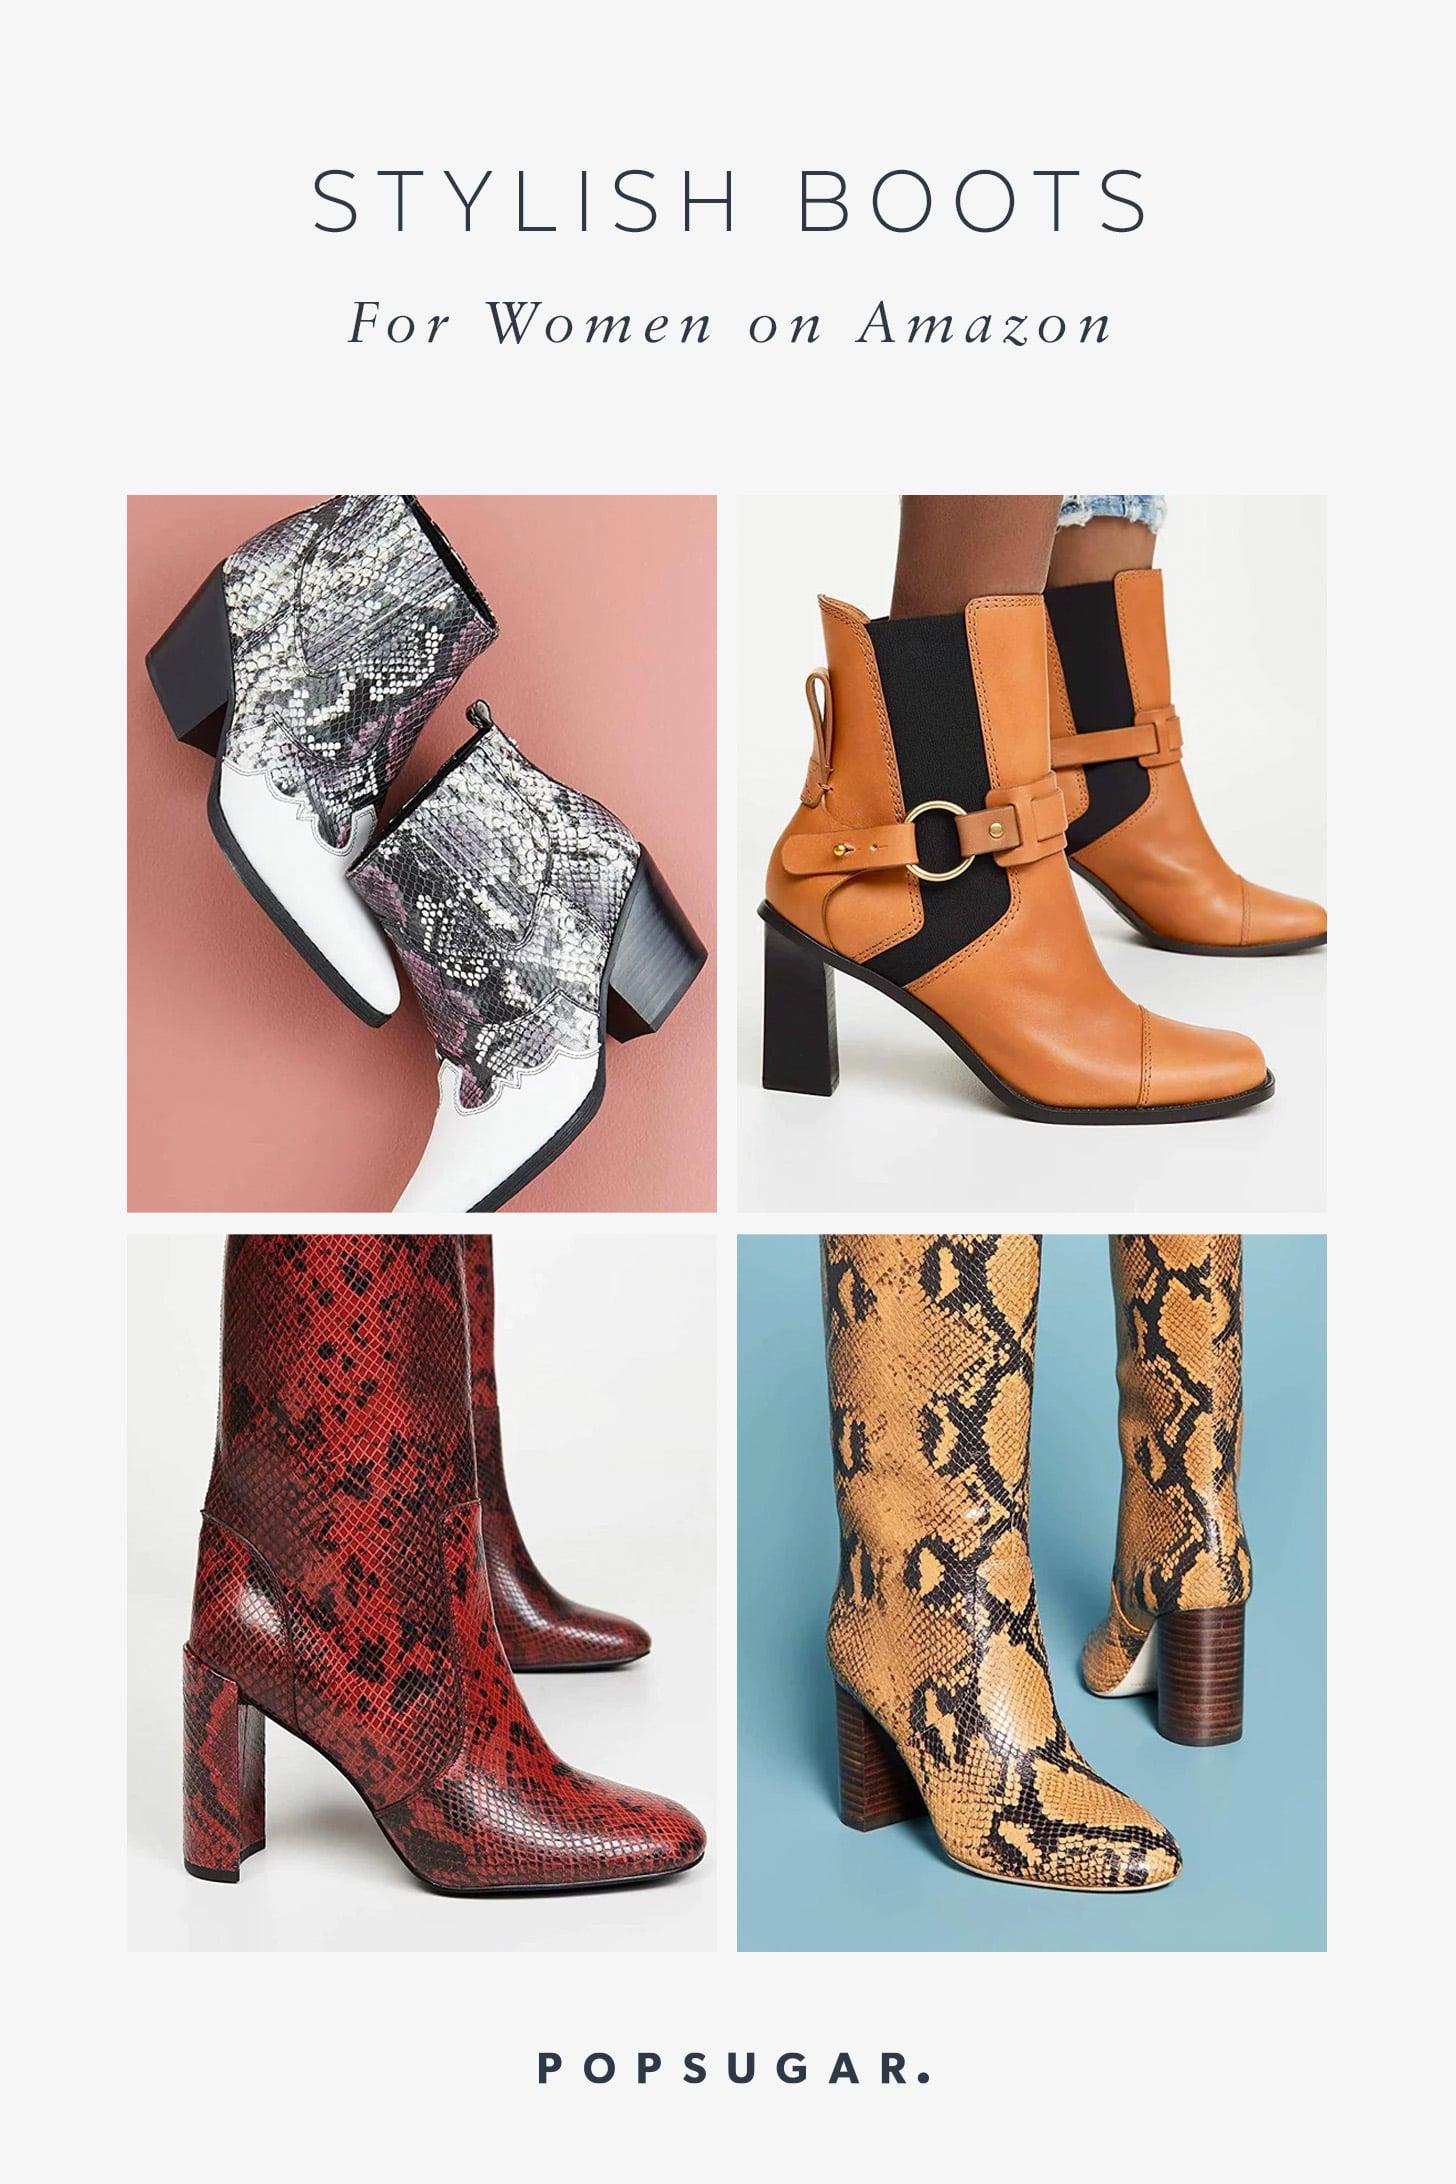 Stylish Boots For Women on Amazon